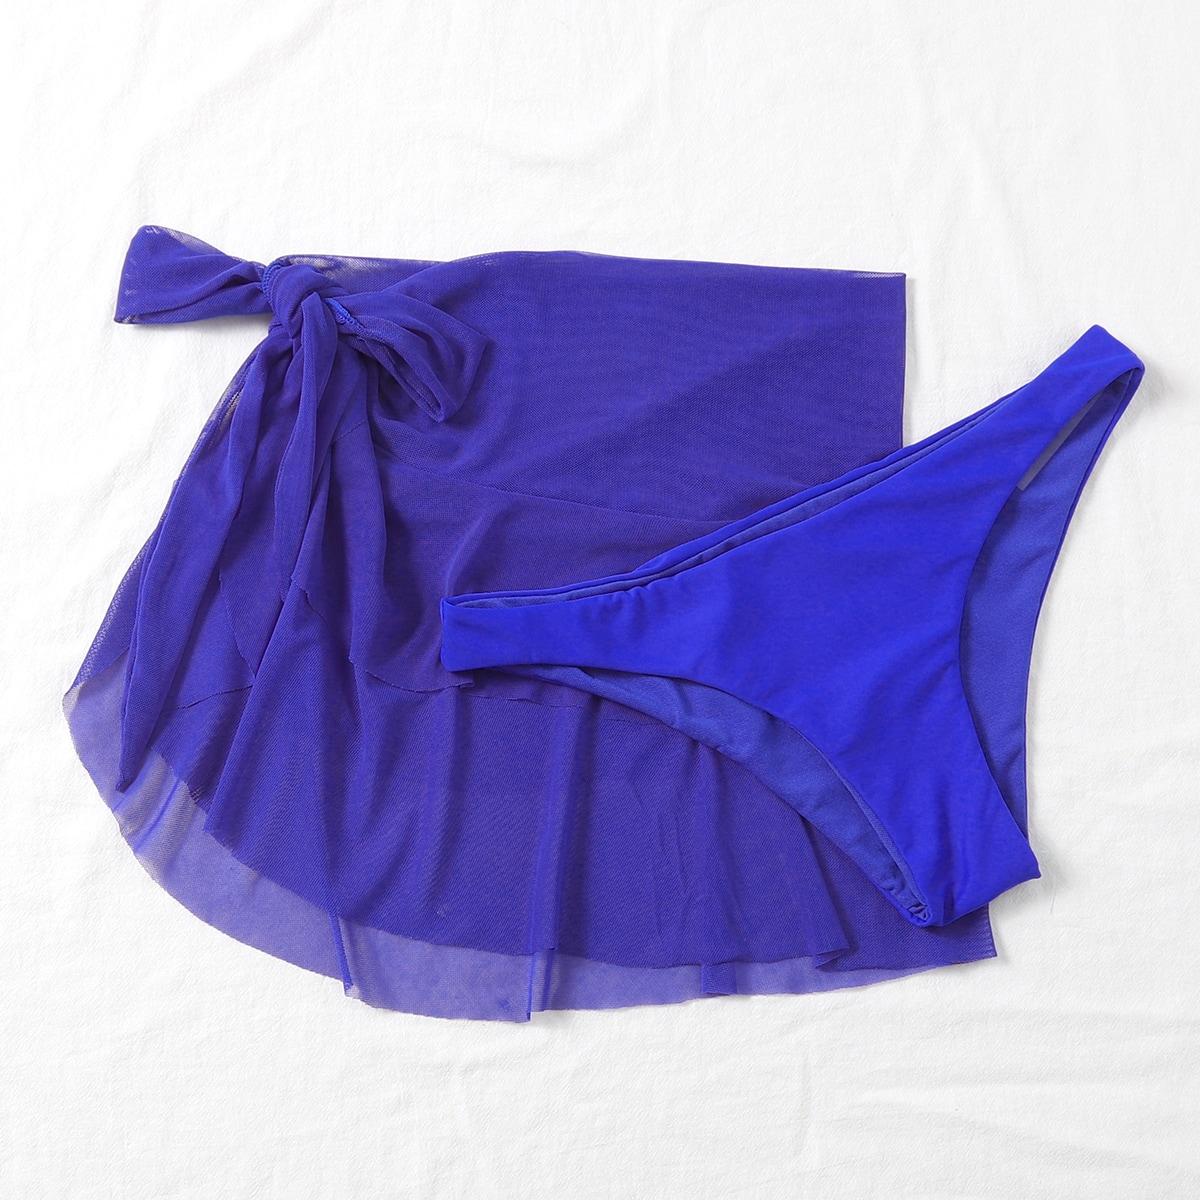 Плавки бикини и сетчатая пляжная юбка 2шт